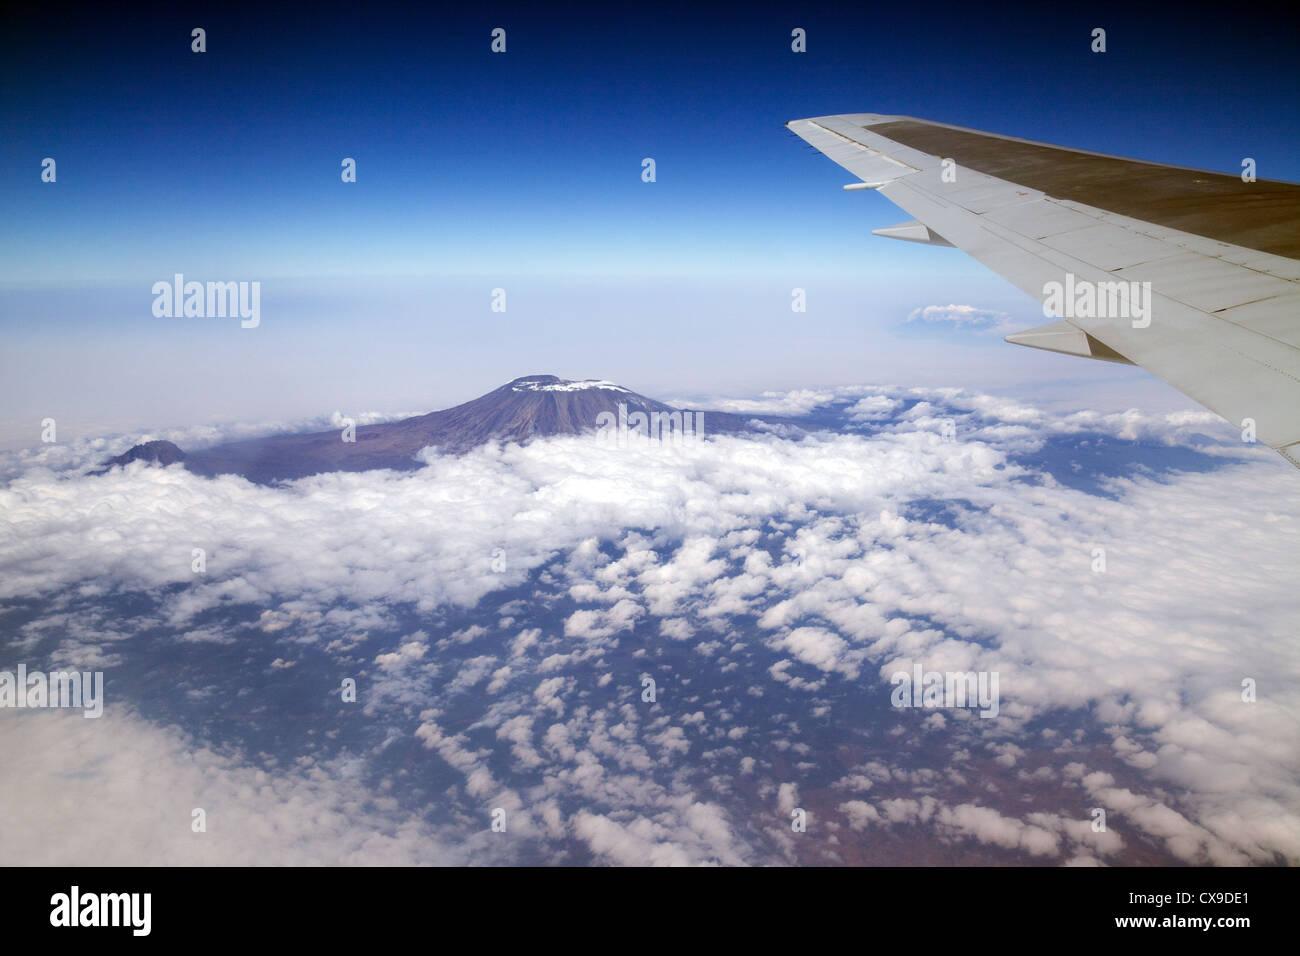 Mount Kilimanjaro, Tanzania aerial view from a plane - Stock Image